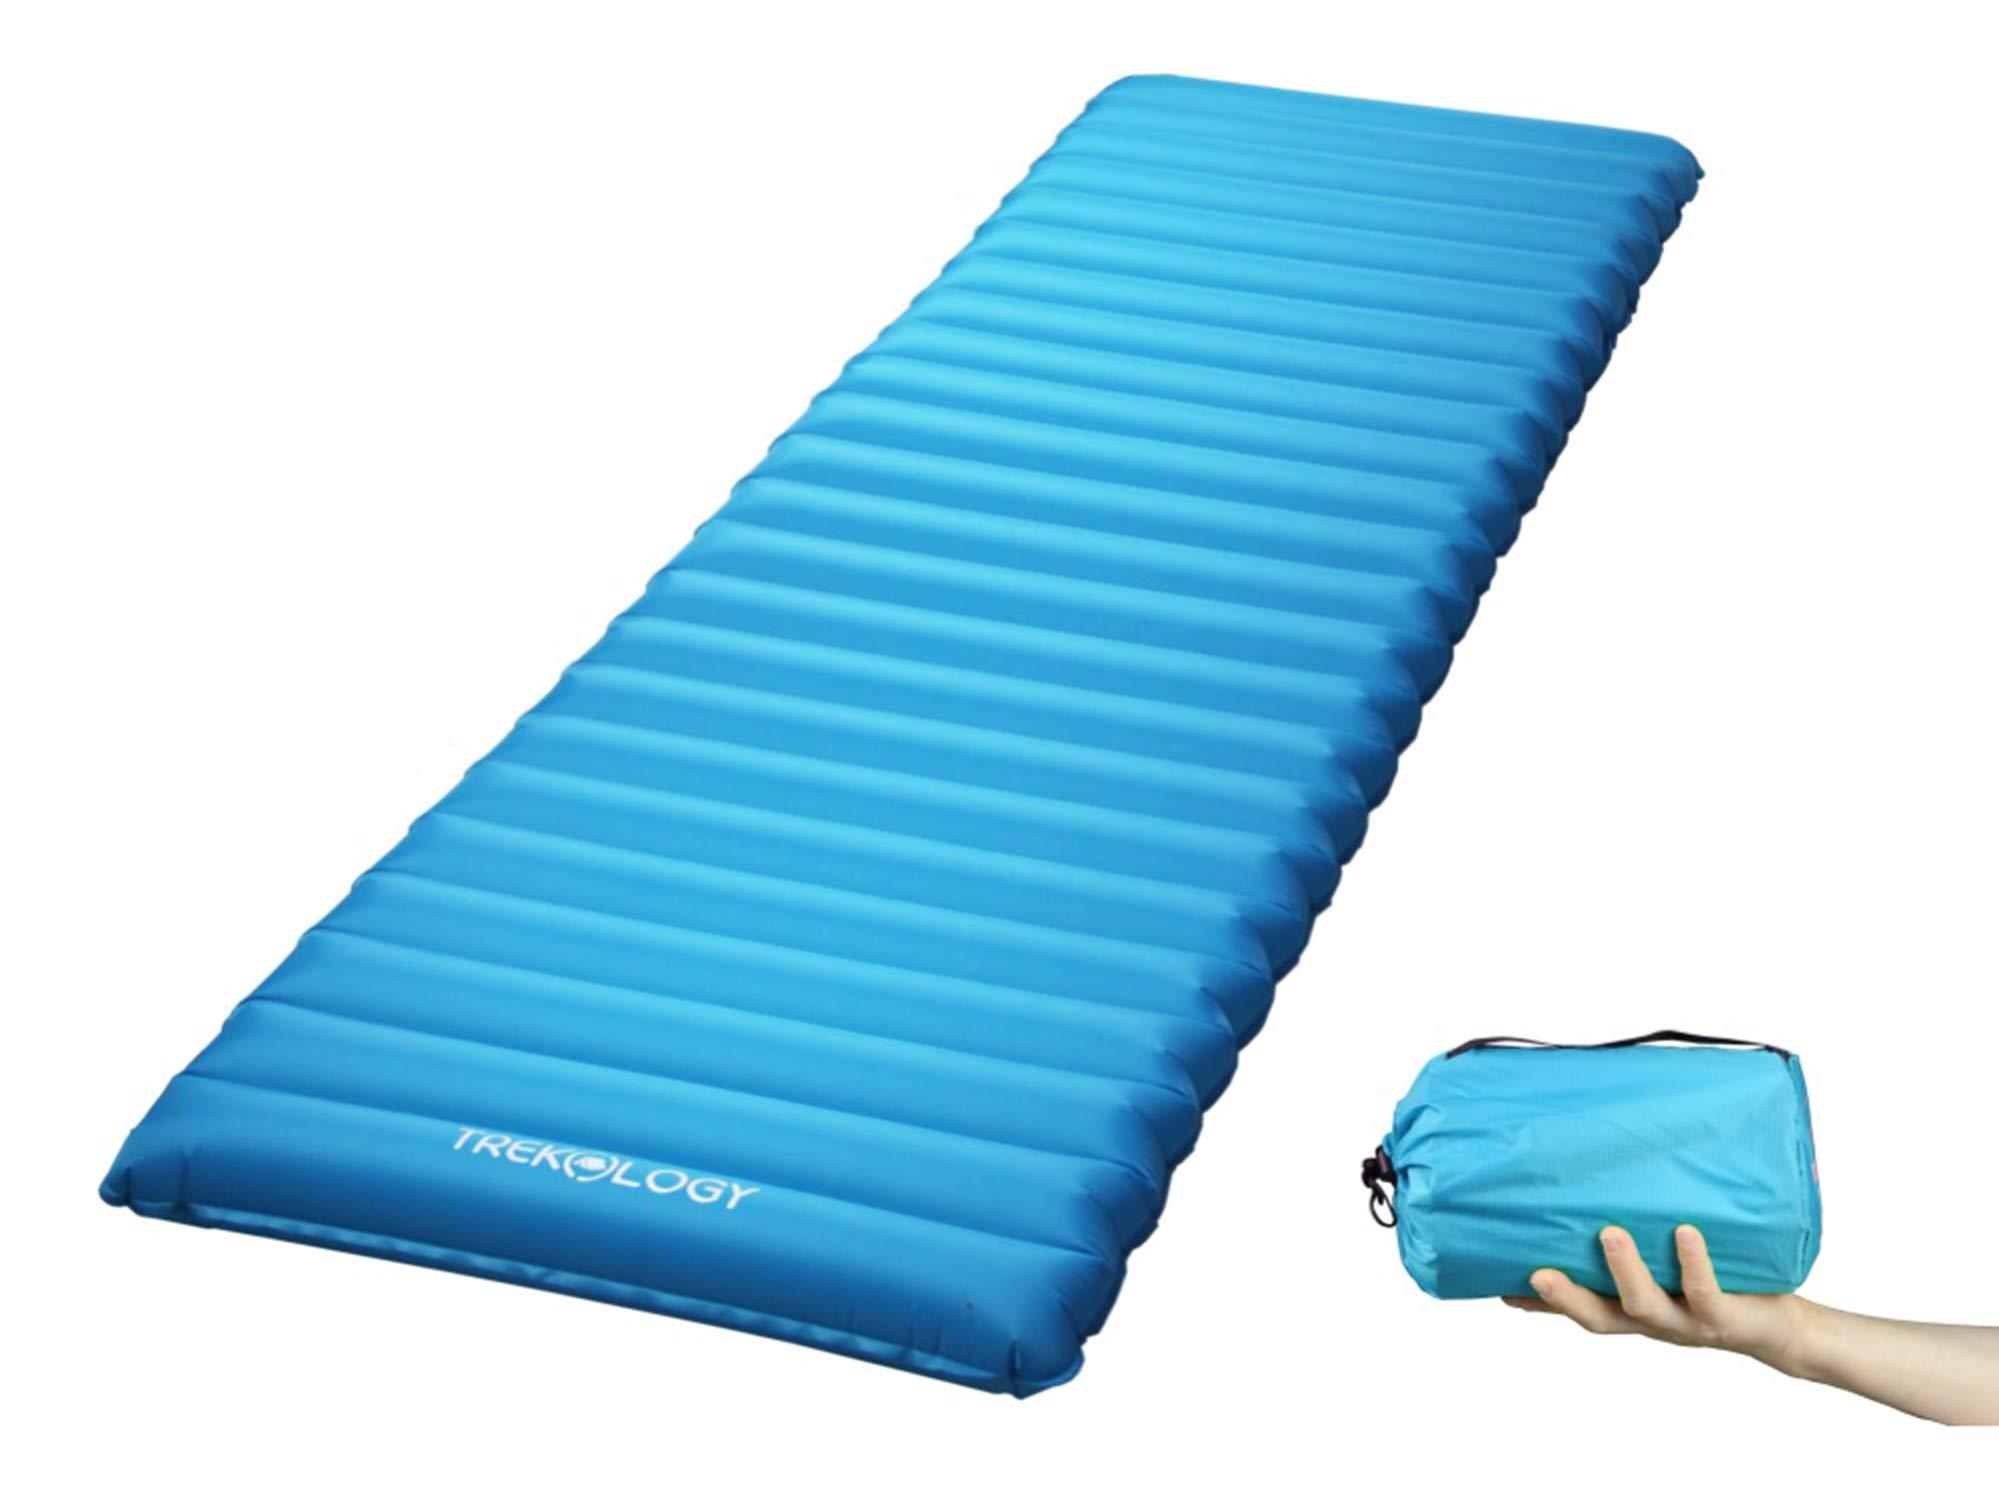 Ultralight Sleeping Pad, Inflating Camping Mattress w/Air Pump Dry Sack Bag - Compact Lightweight Camp Mat, Inflatable Backpacking Gear as Tent Pads, Hammock Mats for Travel, Hiking, Sleep (Teal Blue) by Trekology